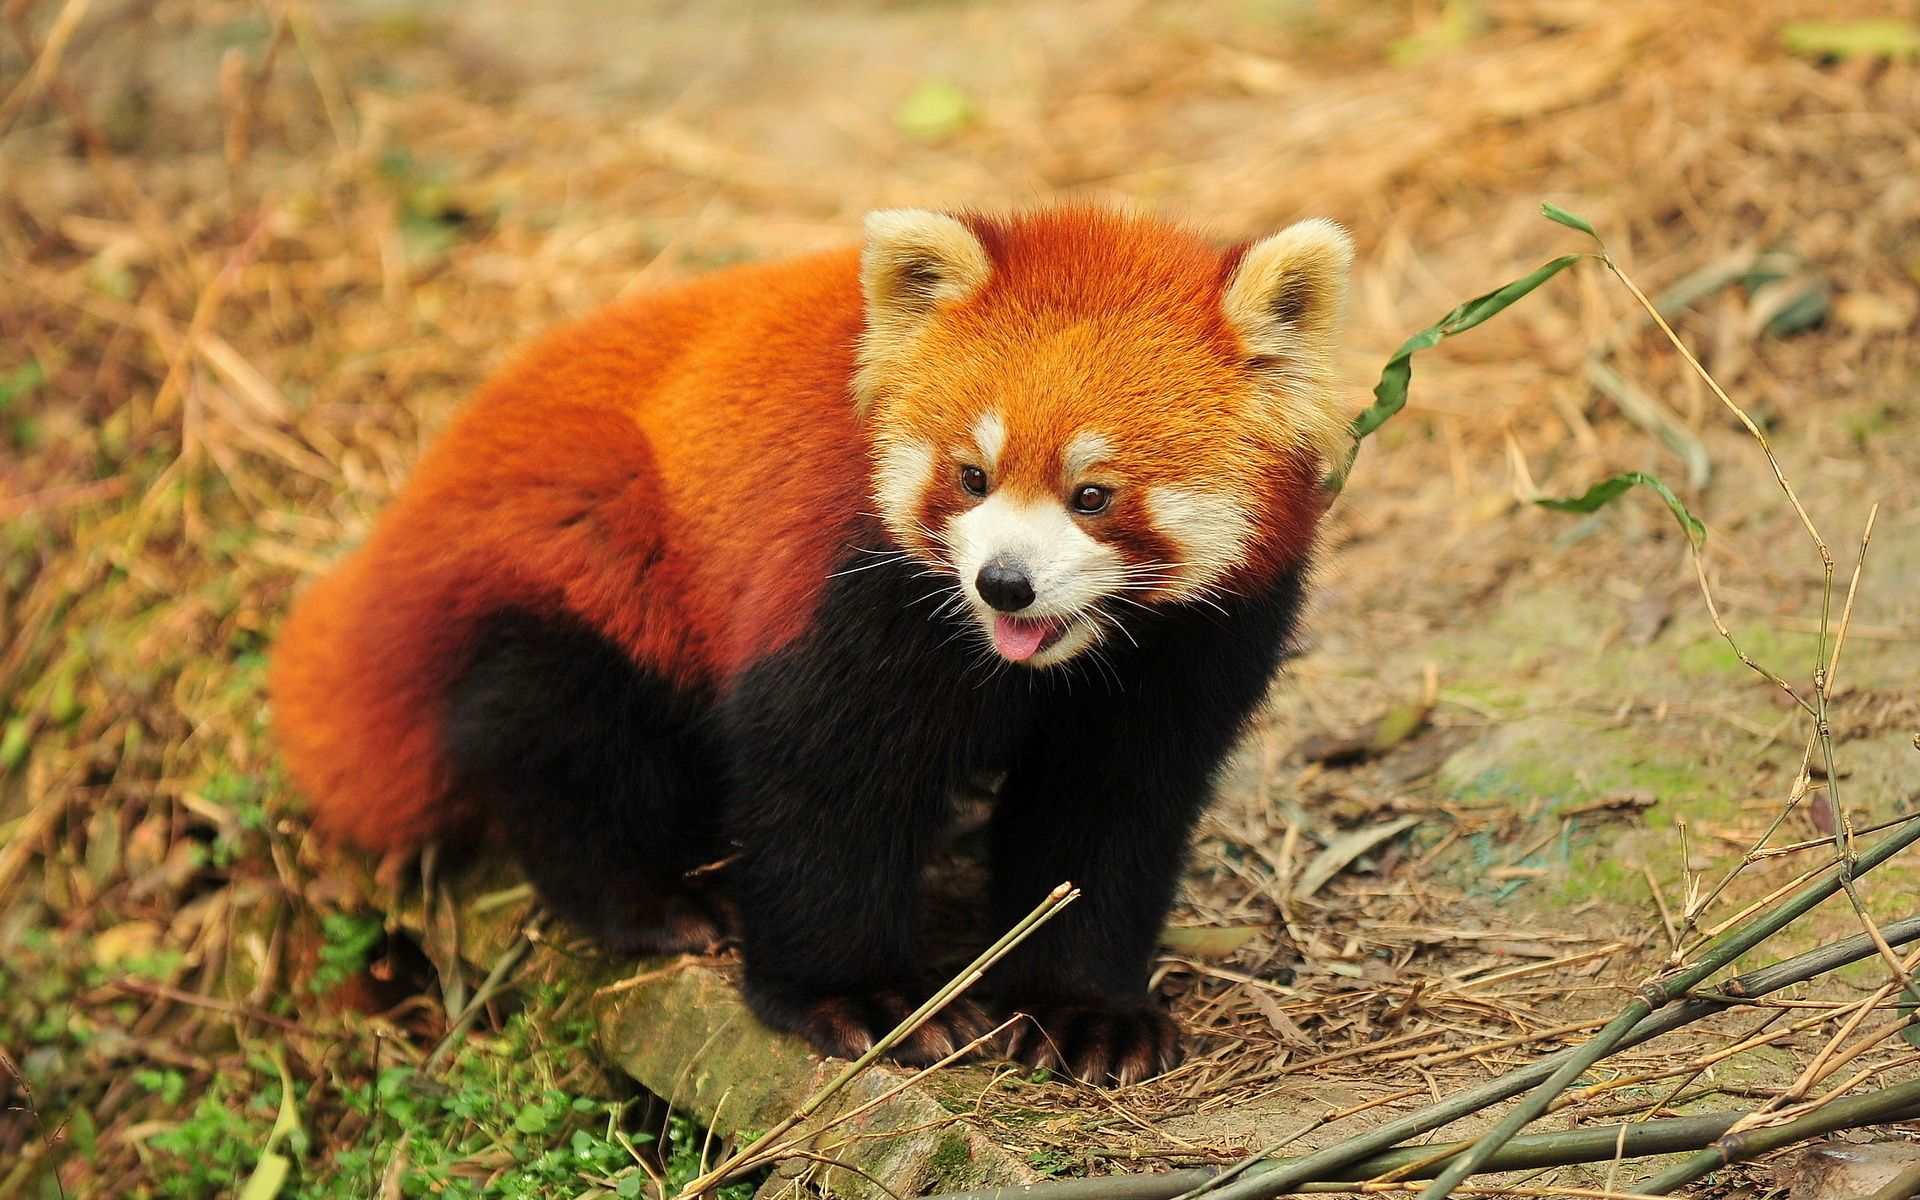 Cute Red Panda Desktop Background HD 1920x1200 deskbg